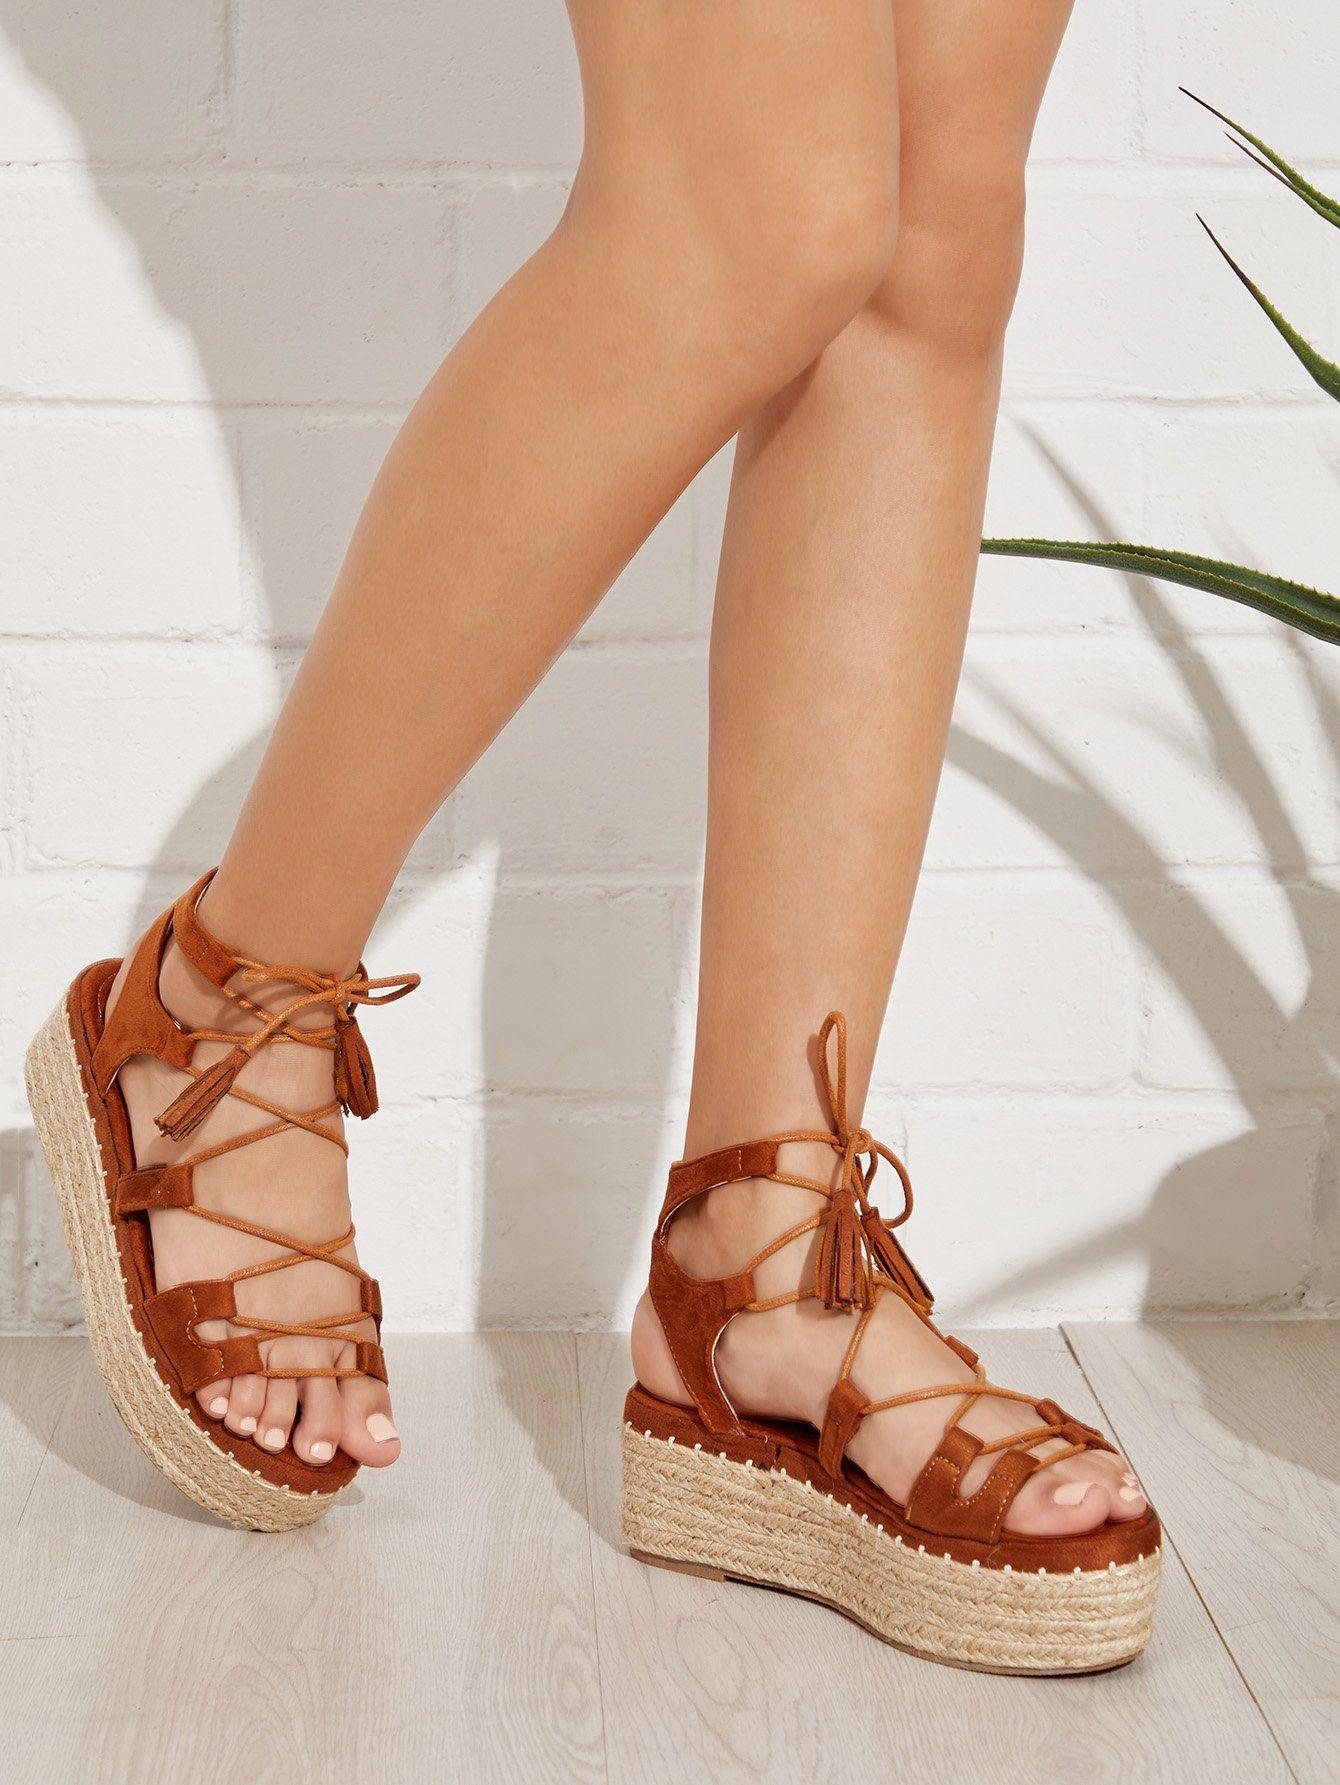 7ec3bfcced9372 Criss Cross Flatform Suede Sandals -SheIn(Sheinside)